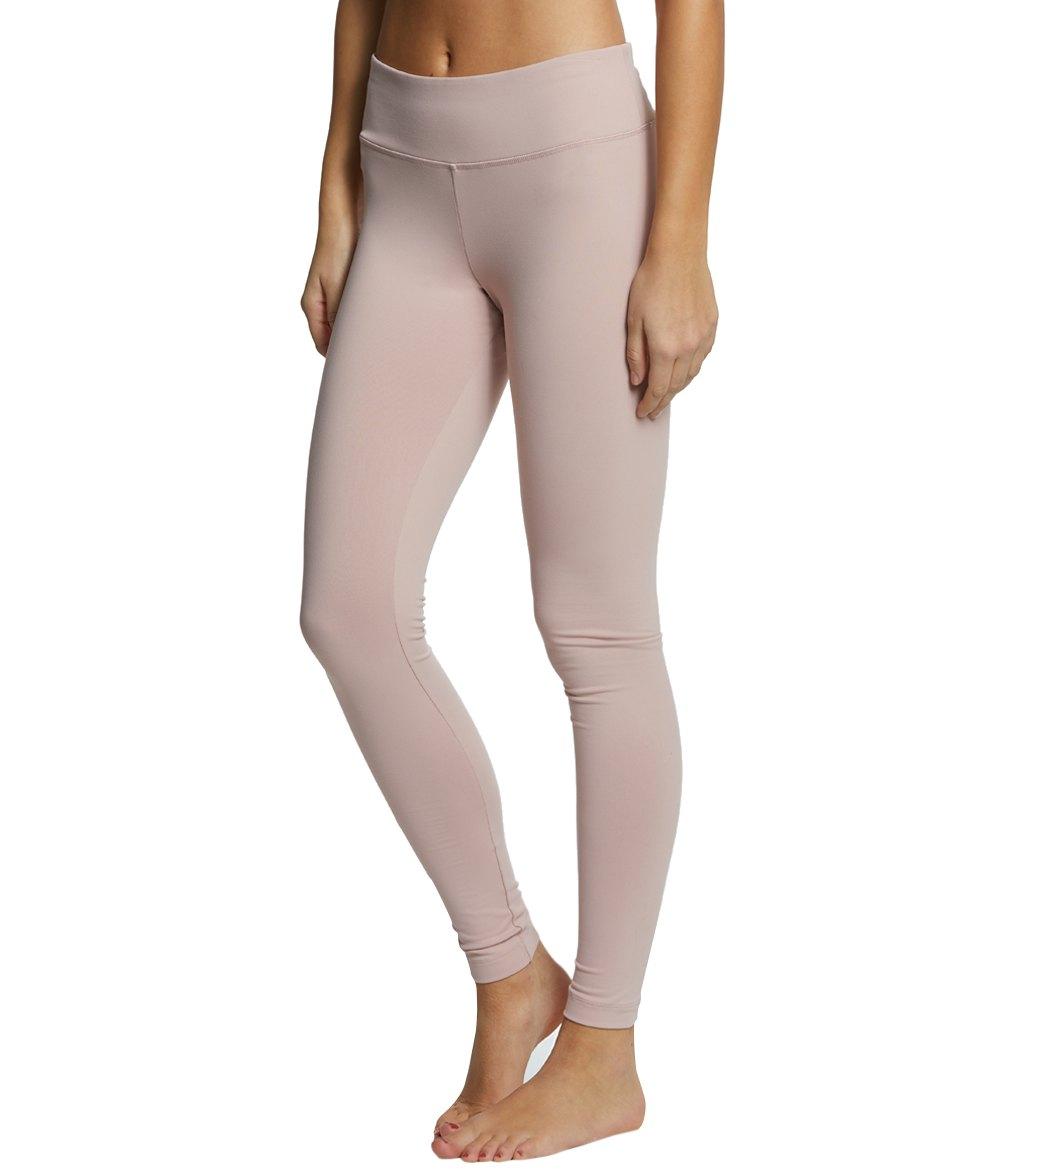 6a0d9b6853df9 Danskin Body Fit Ankle Yoga Leggings at YogaOutlet.com